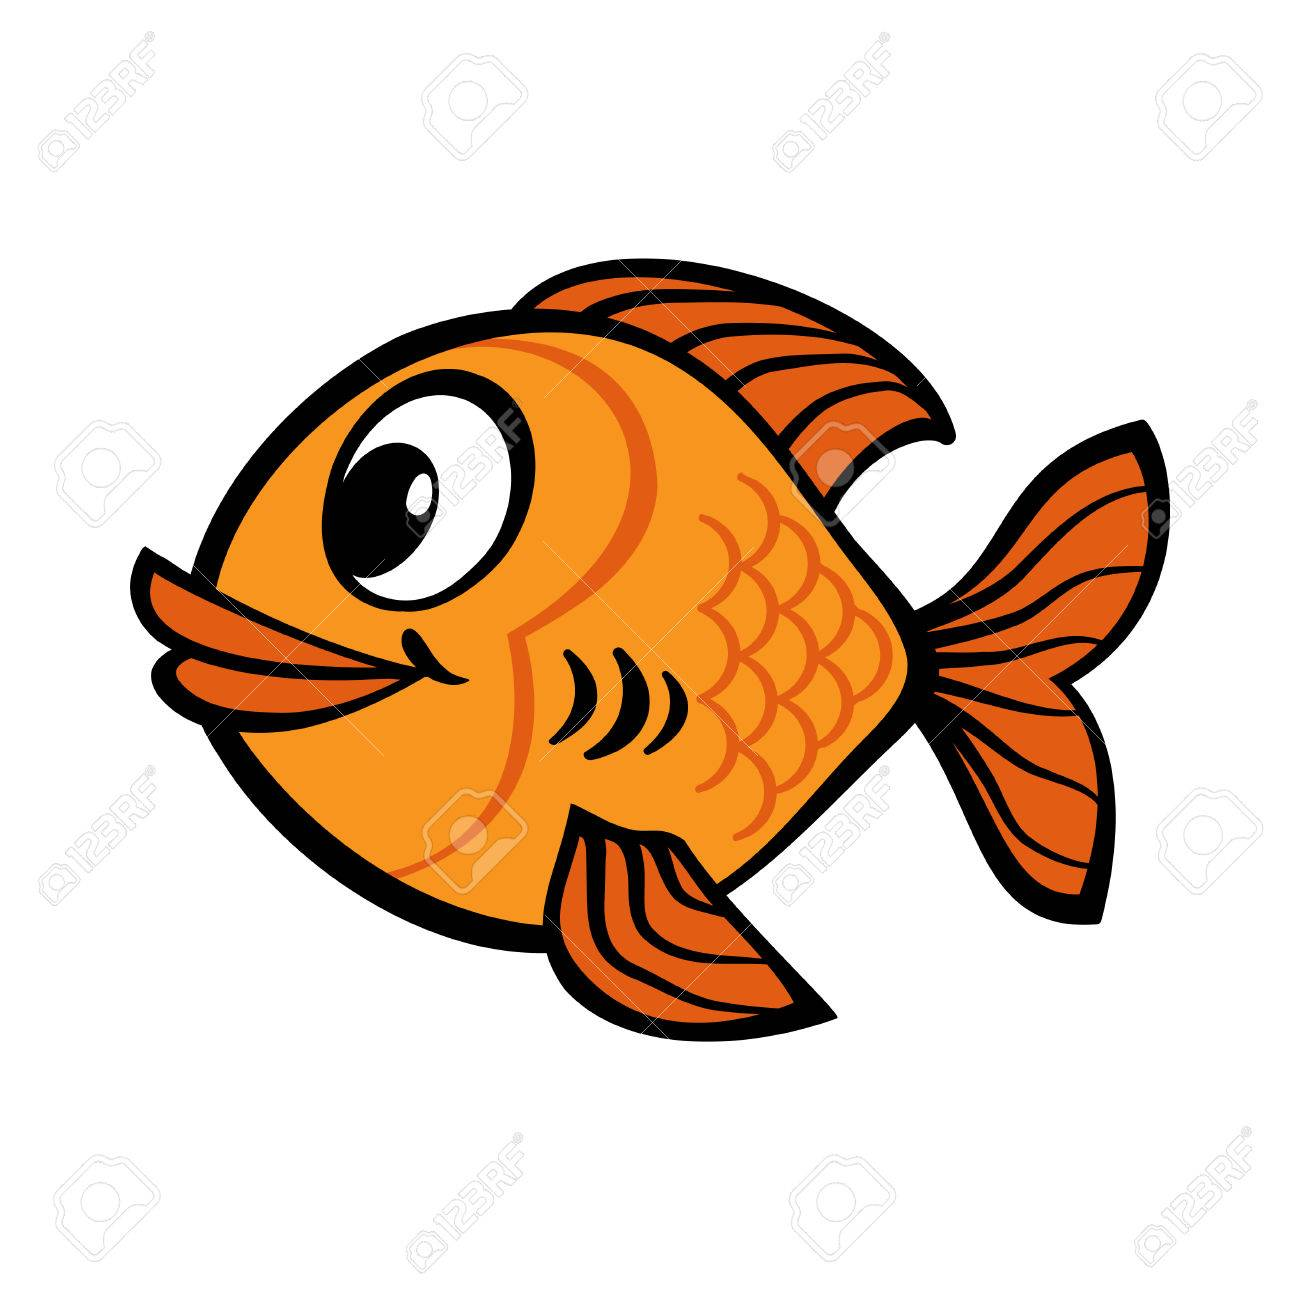 fish cartoon vector icon royalty free cliparts vectors and stock